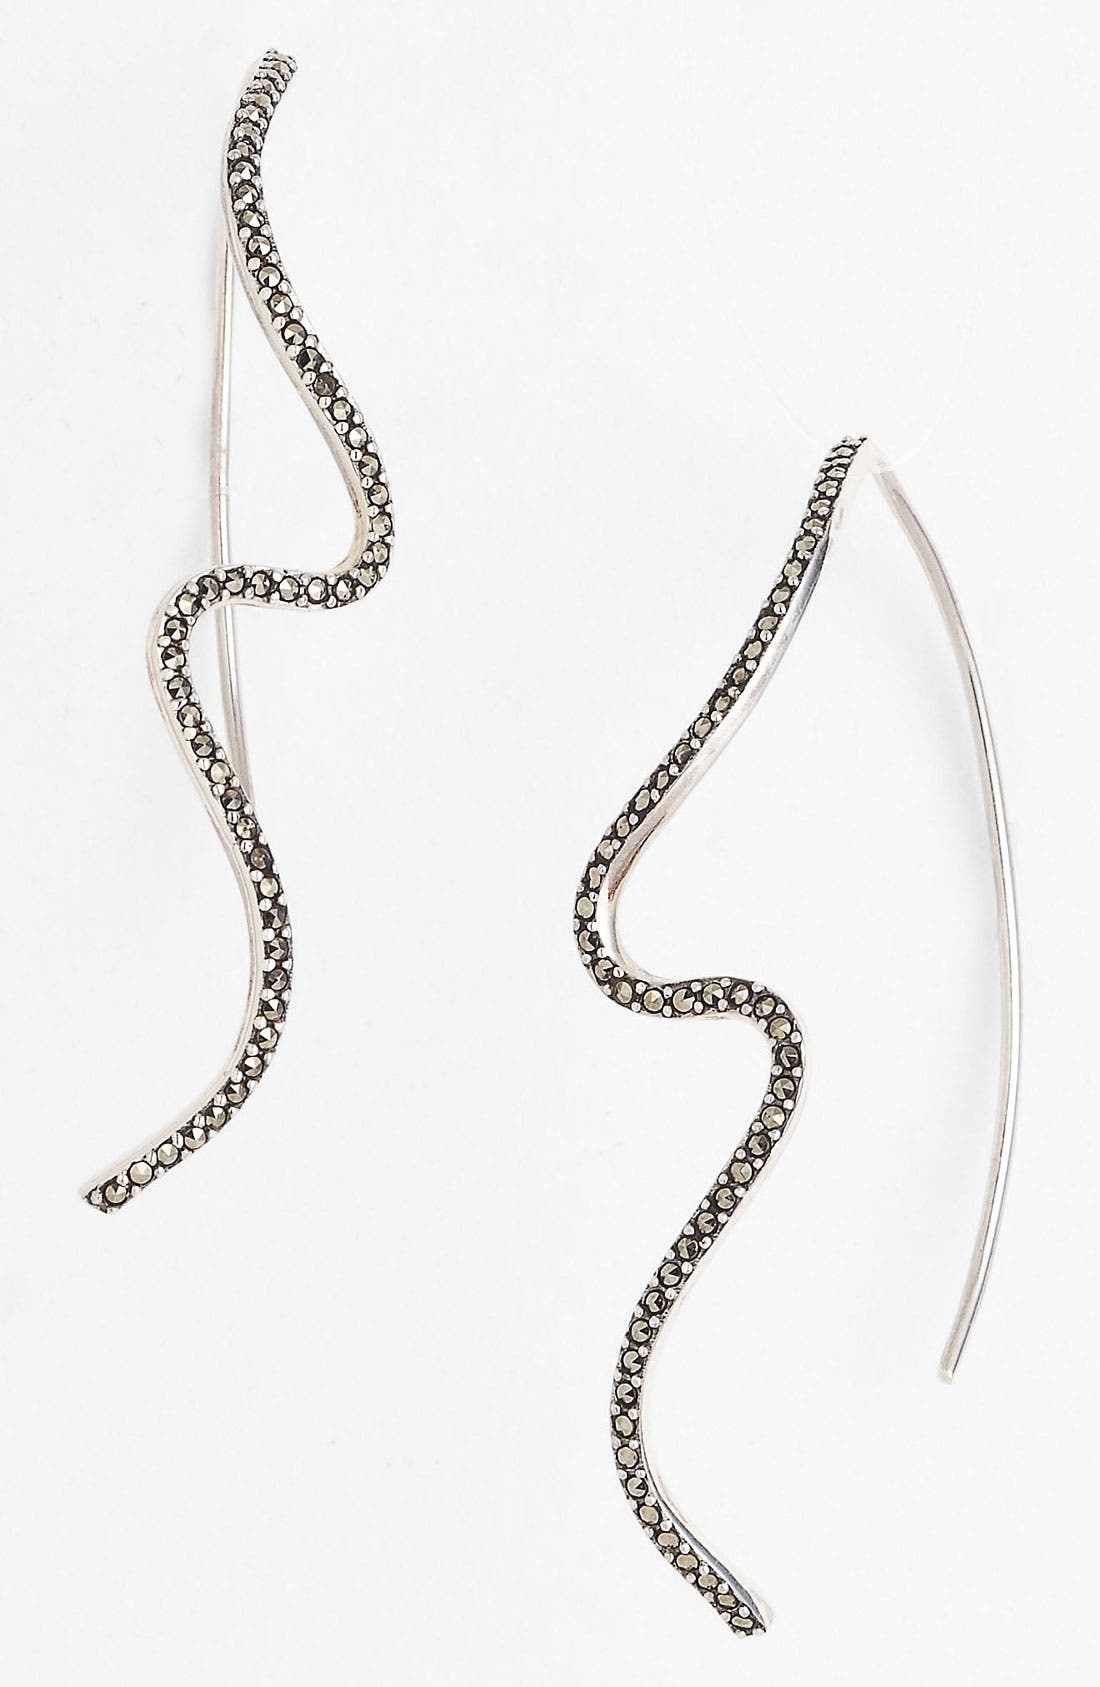 Main Image - Judith Jack 'Fluidity' Linear Earrings